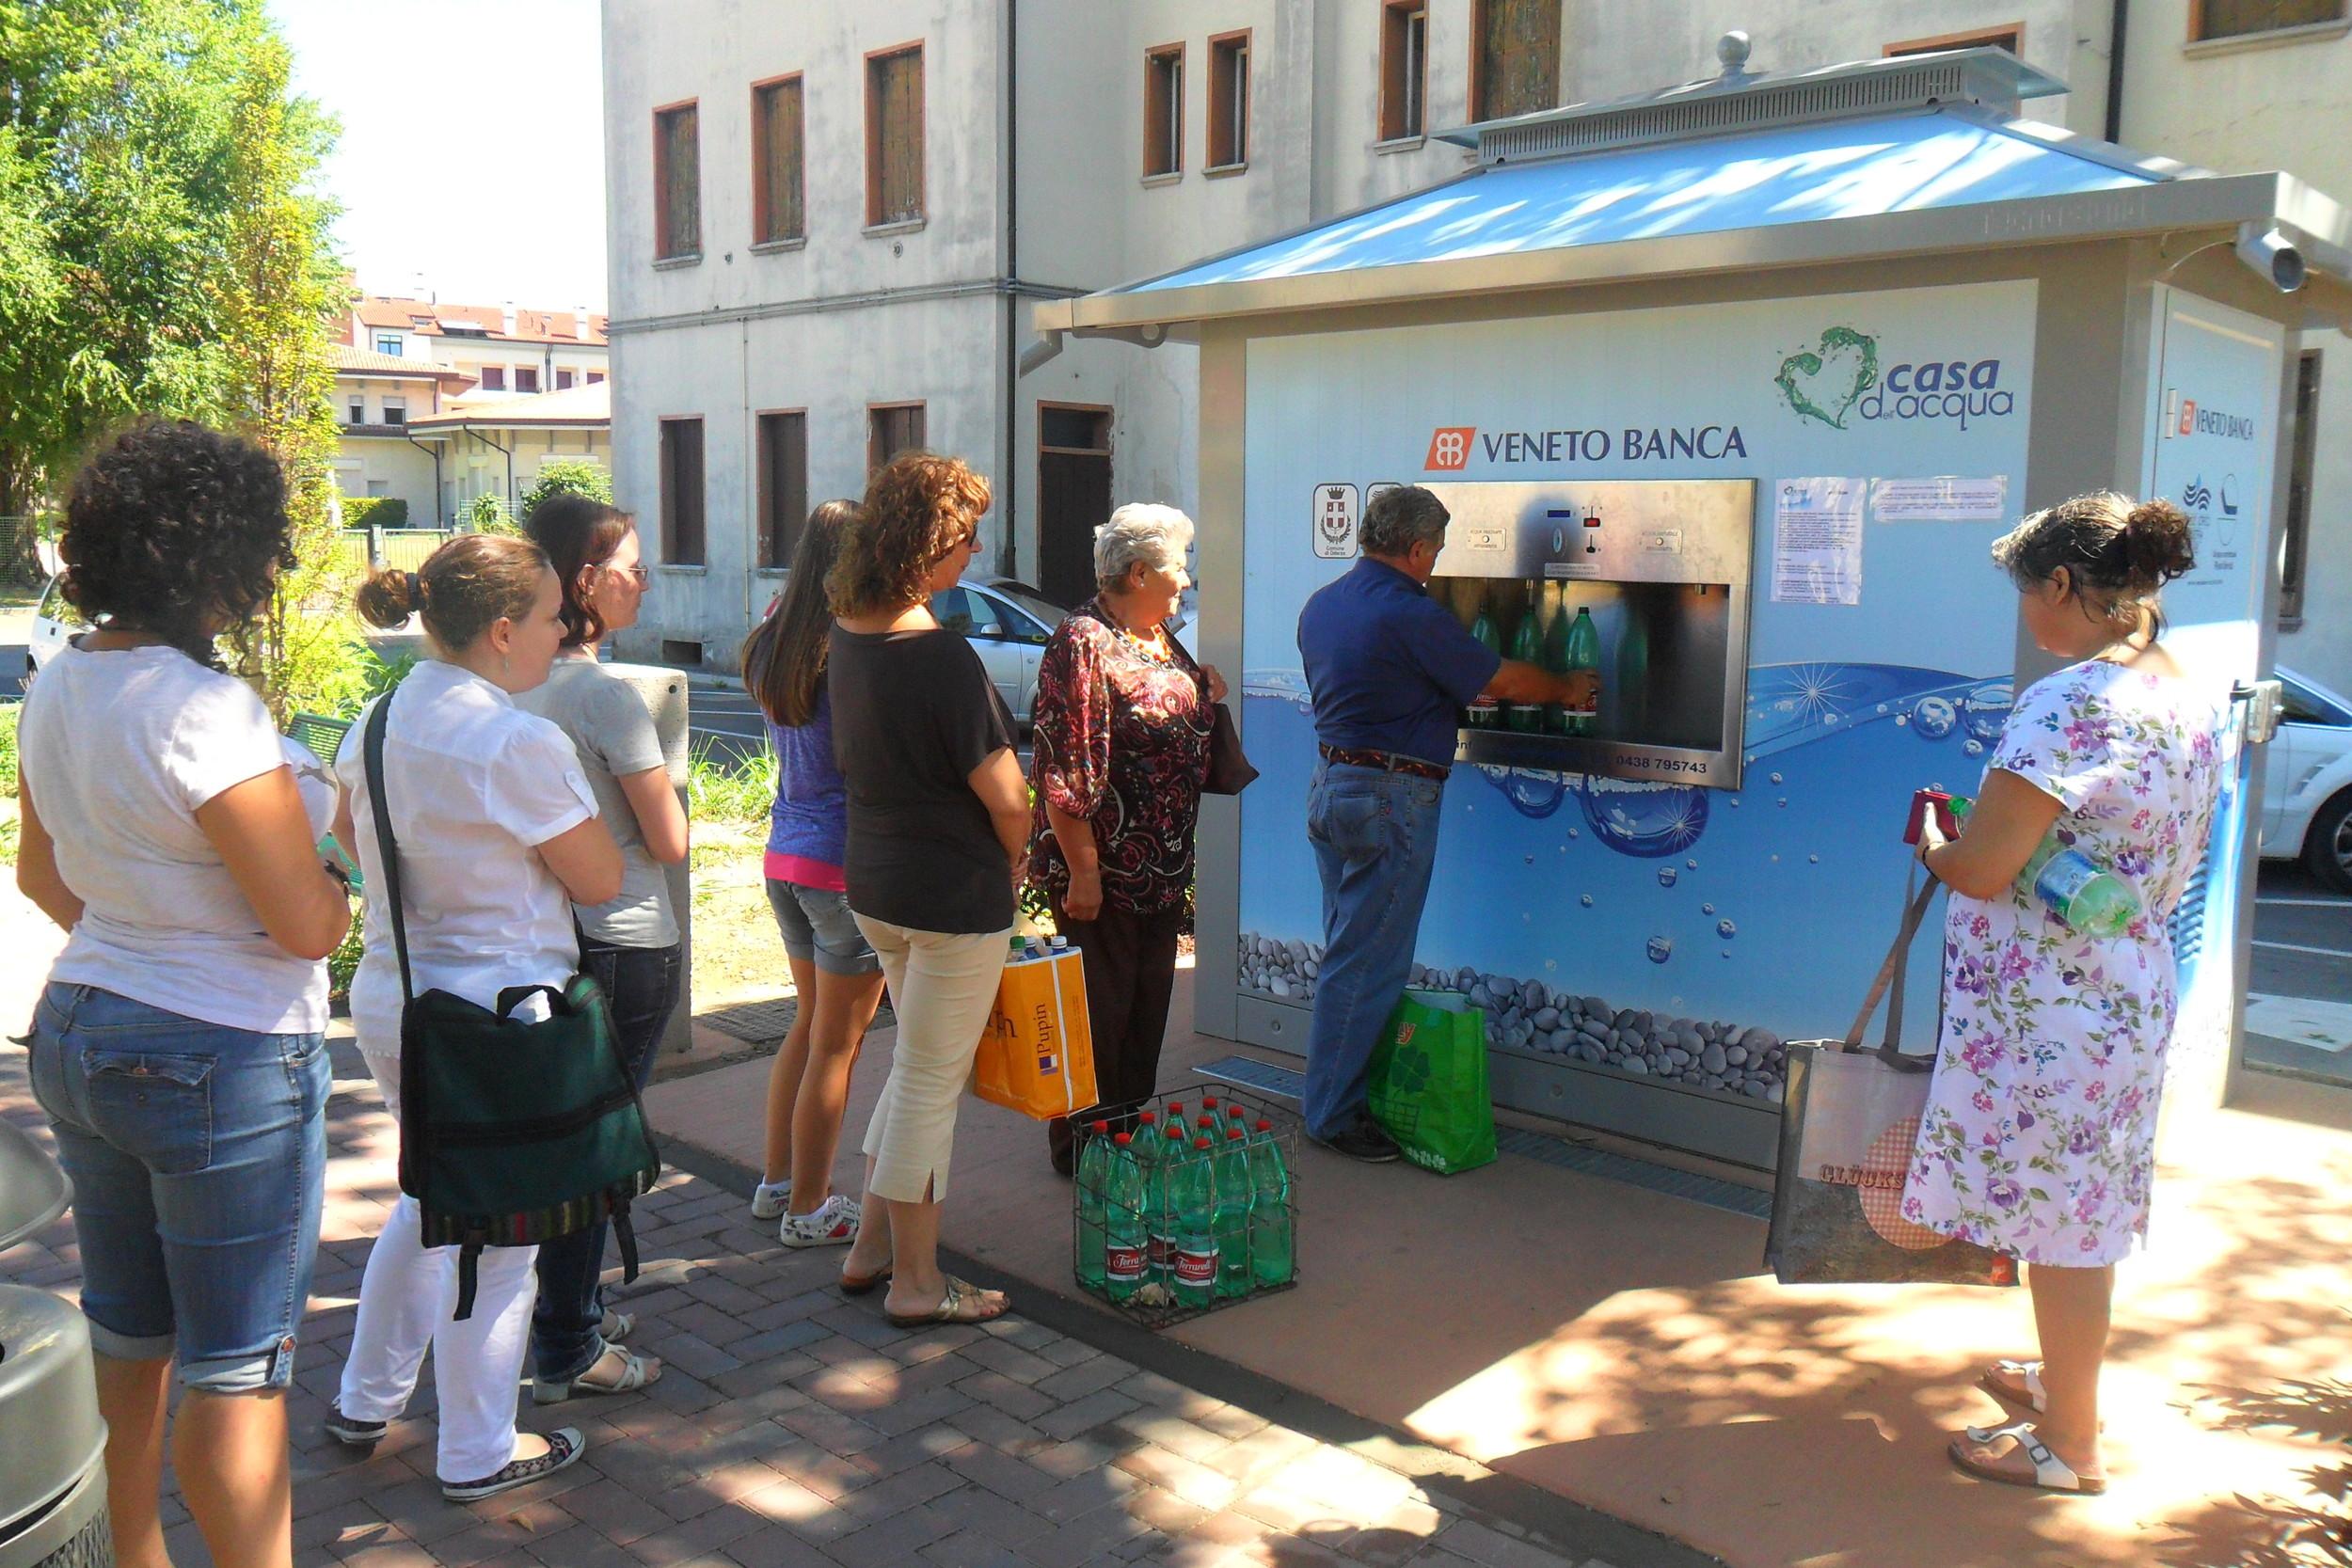 Water vending machines - City/Village  Enter